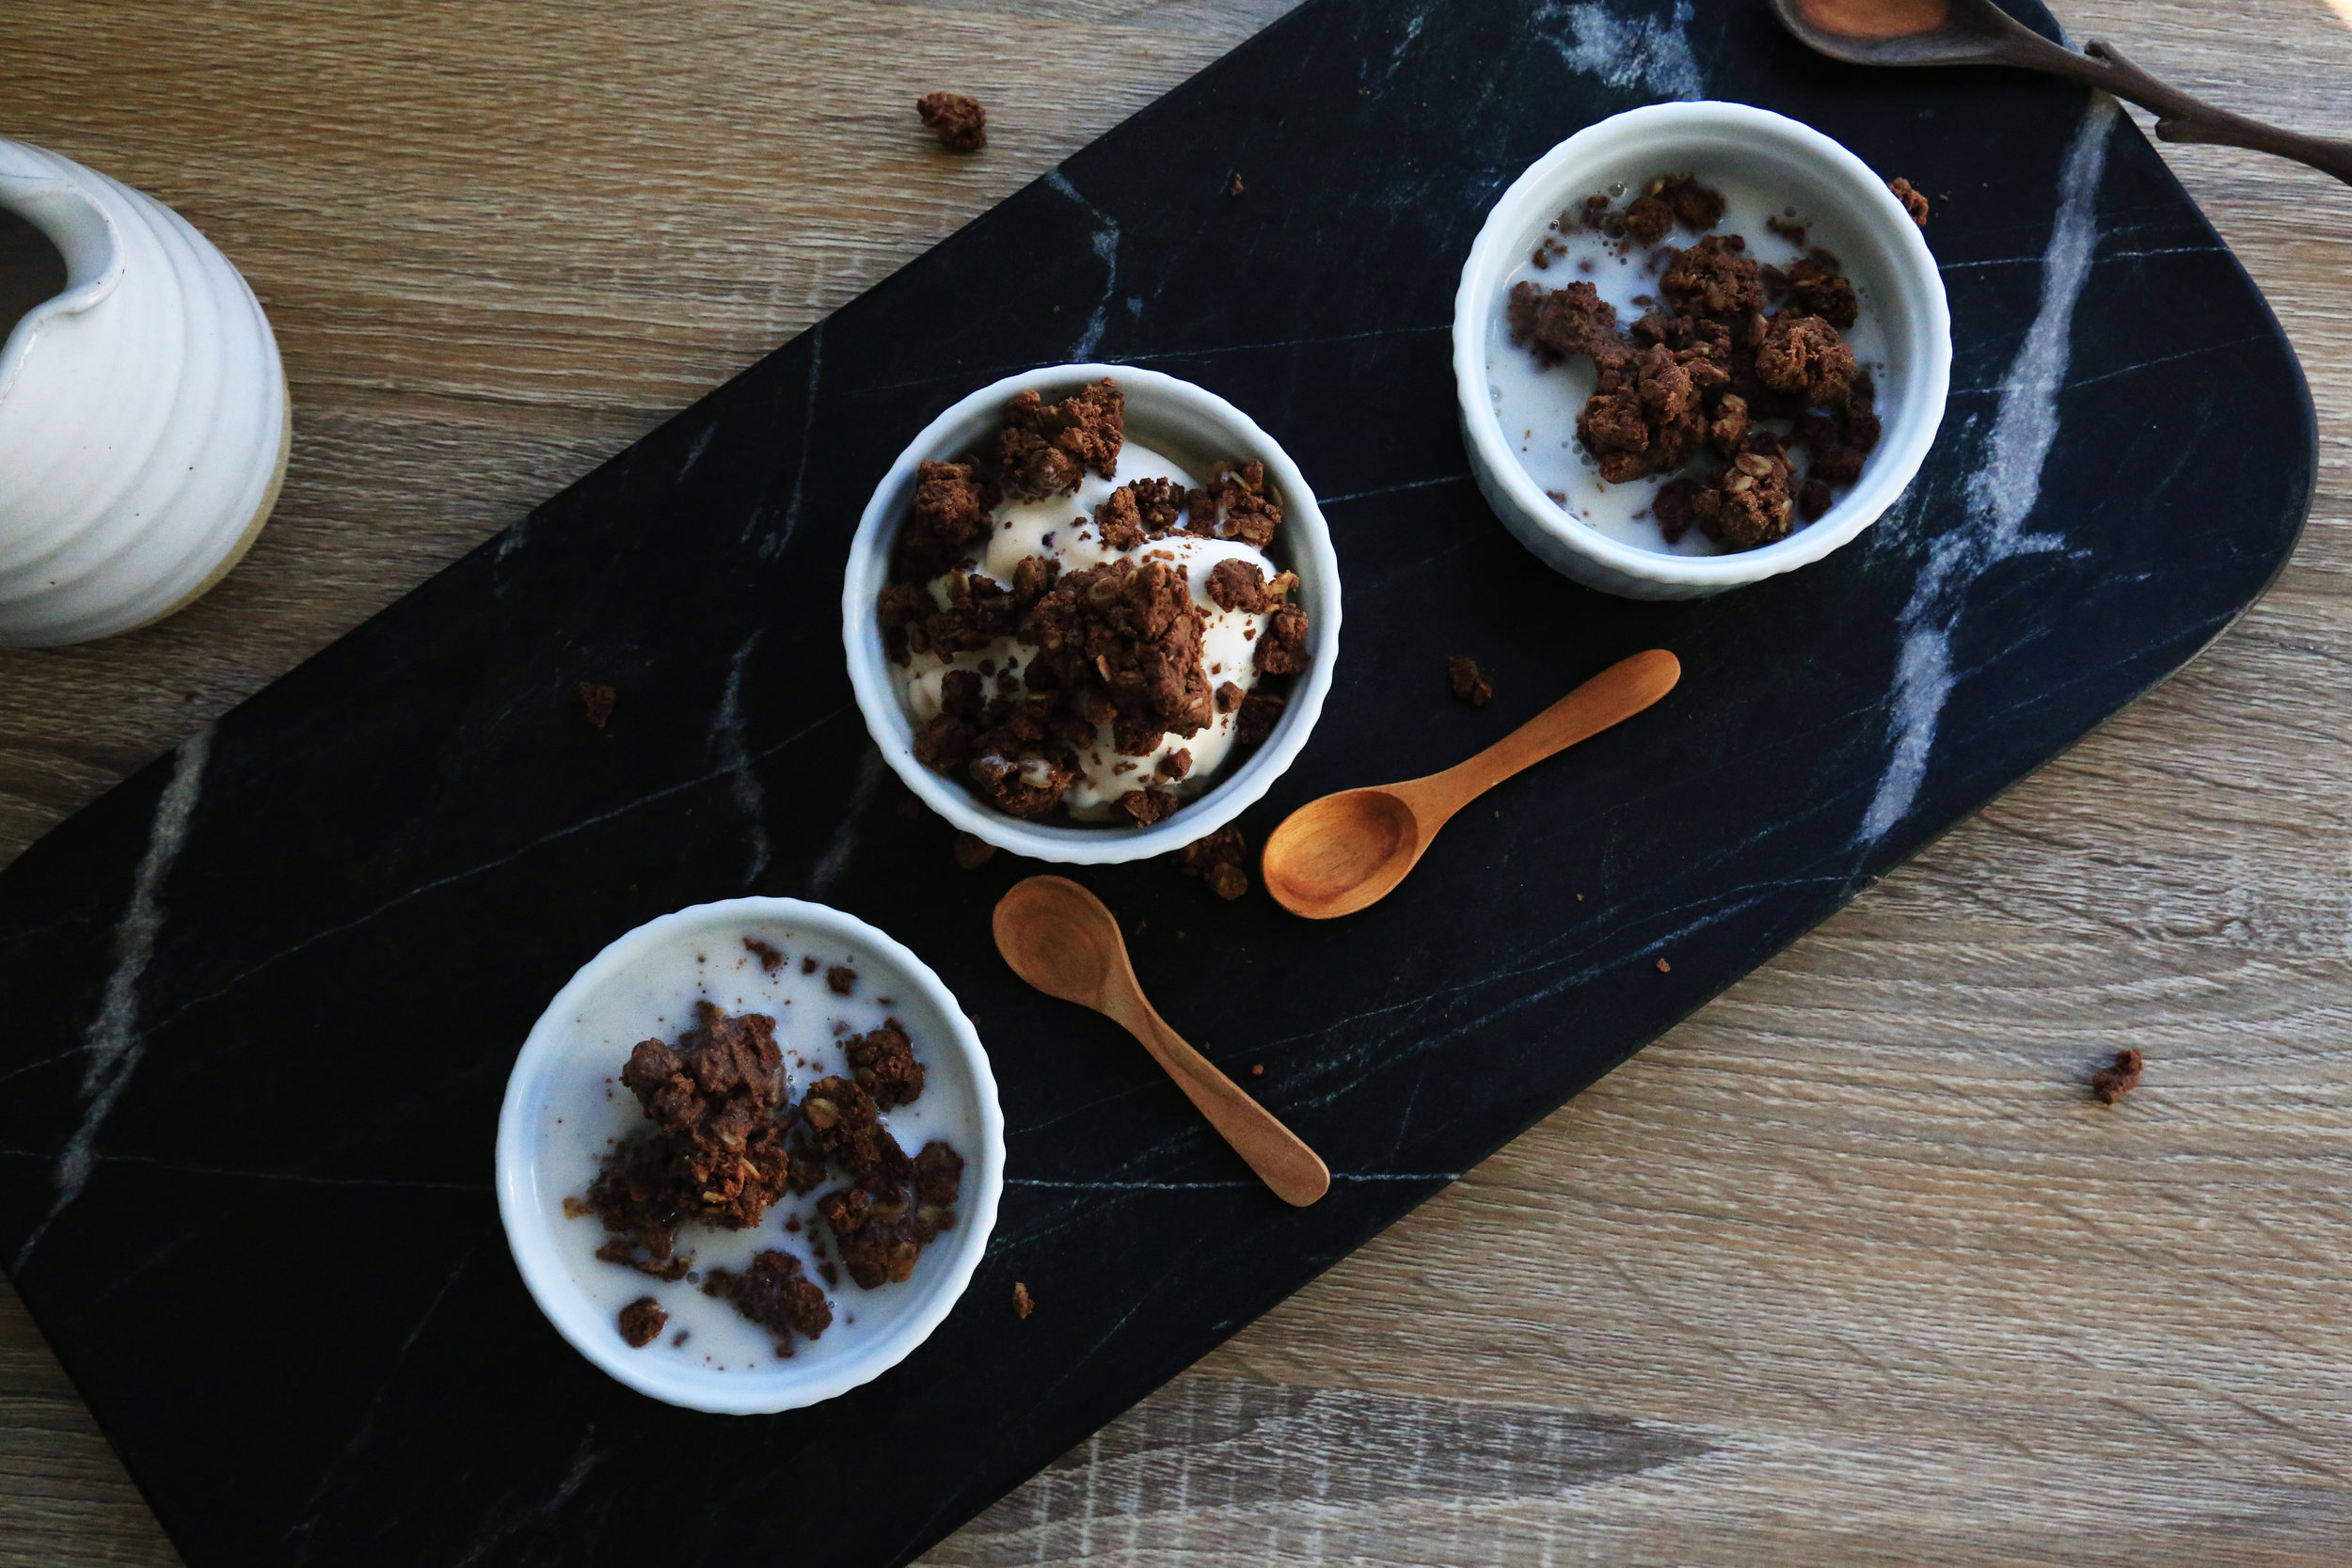 front_paige_chocolate_granola_02.JPG